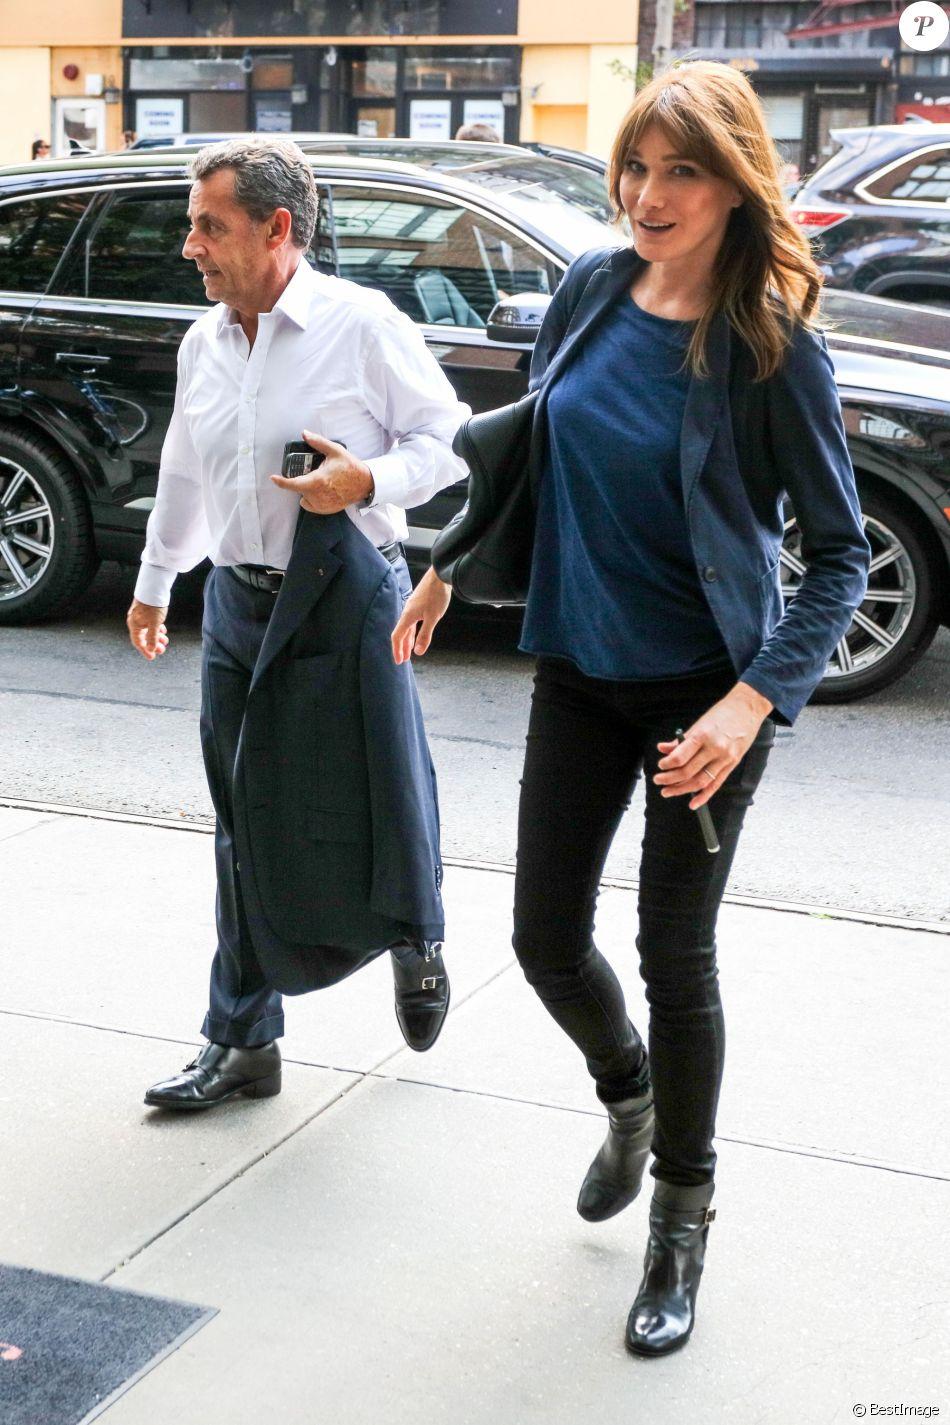 Exclusif - Carla Bruni-Sarkozy et son mari l'ancien Président Nicolas Sarkozy quittent un hôtel de New York le 14 juin 2017.